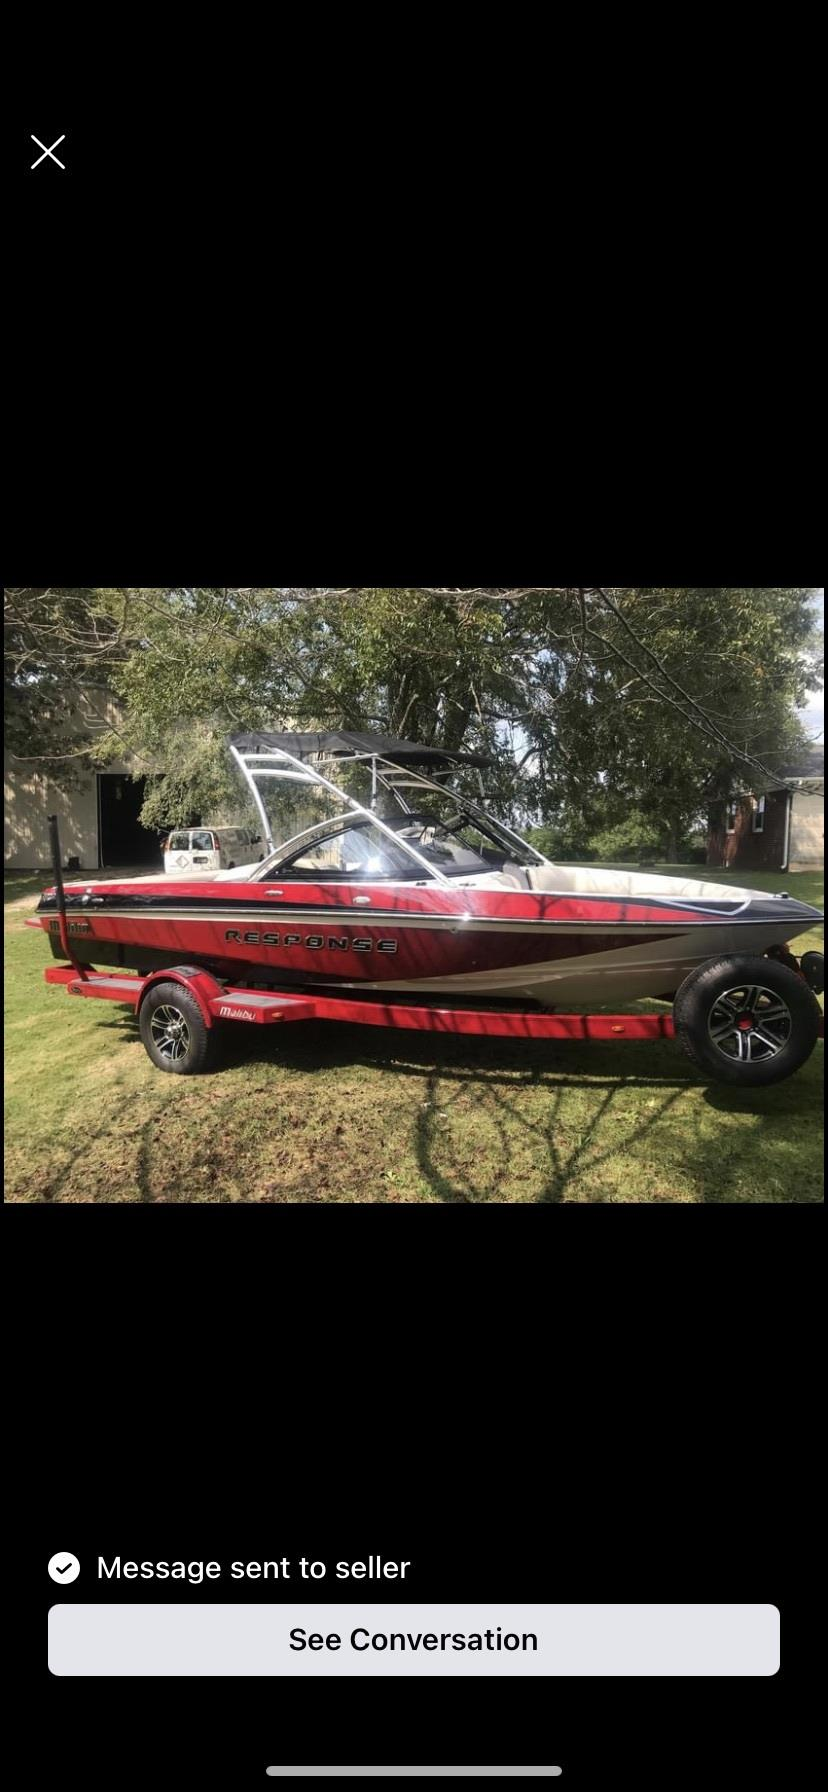 2015 Malibu Response TXI Ski Wake Boat